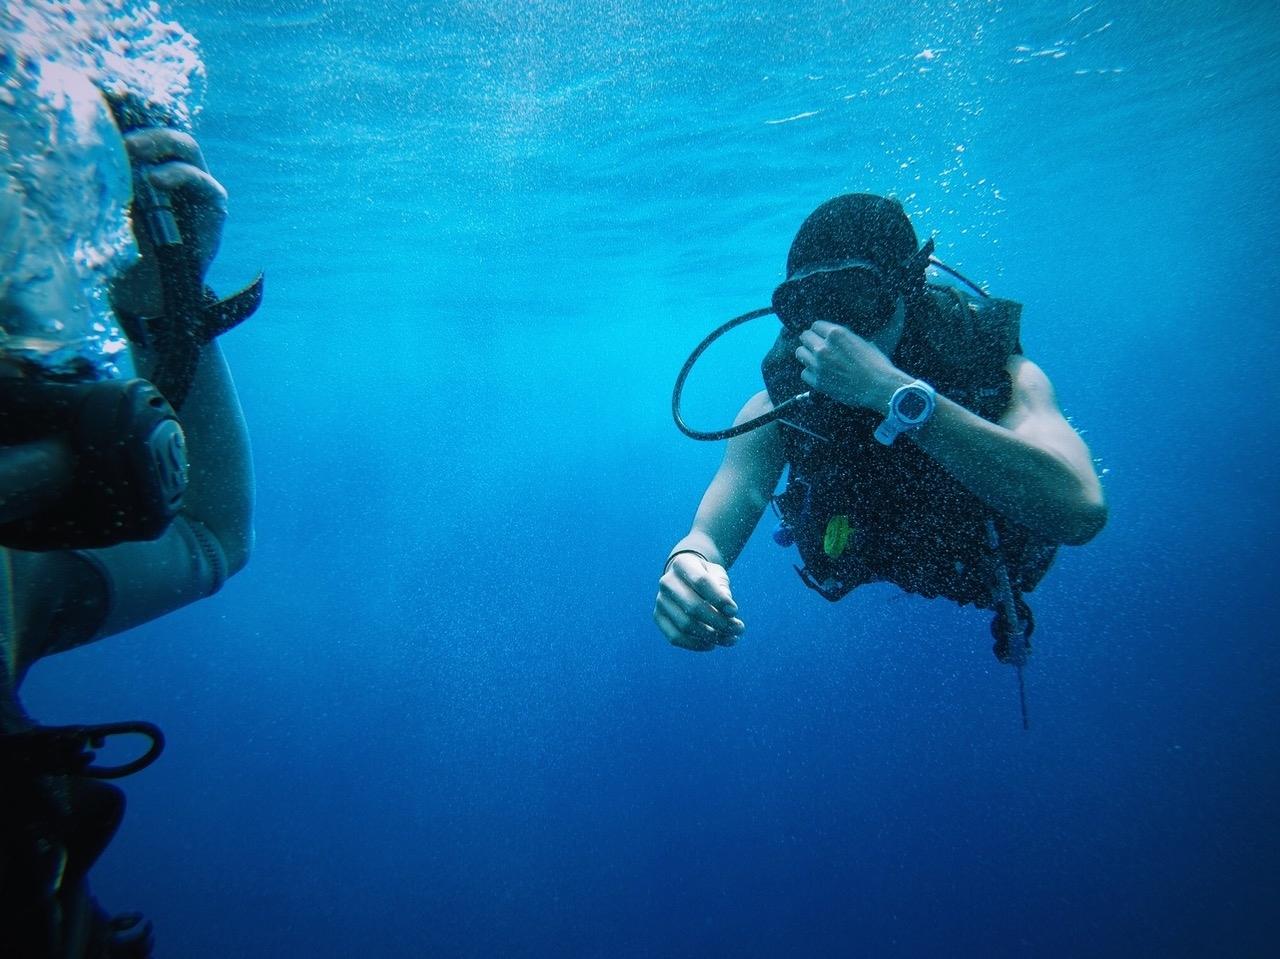 Bateig de submarinisme el diumenge 18 Juny al matí